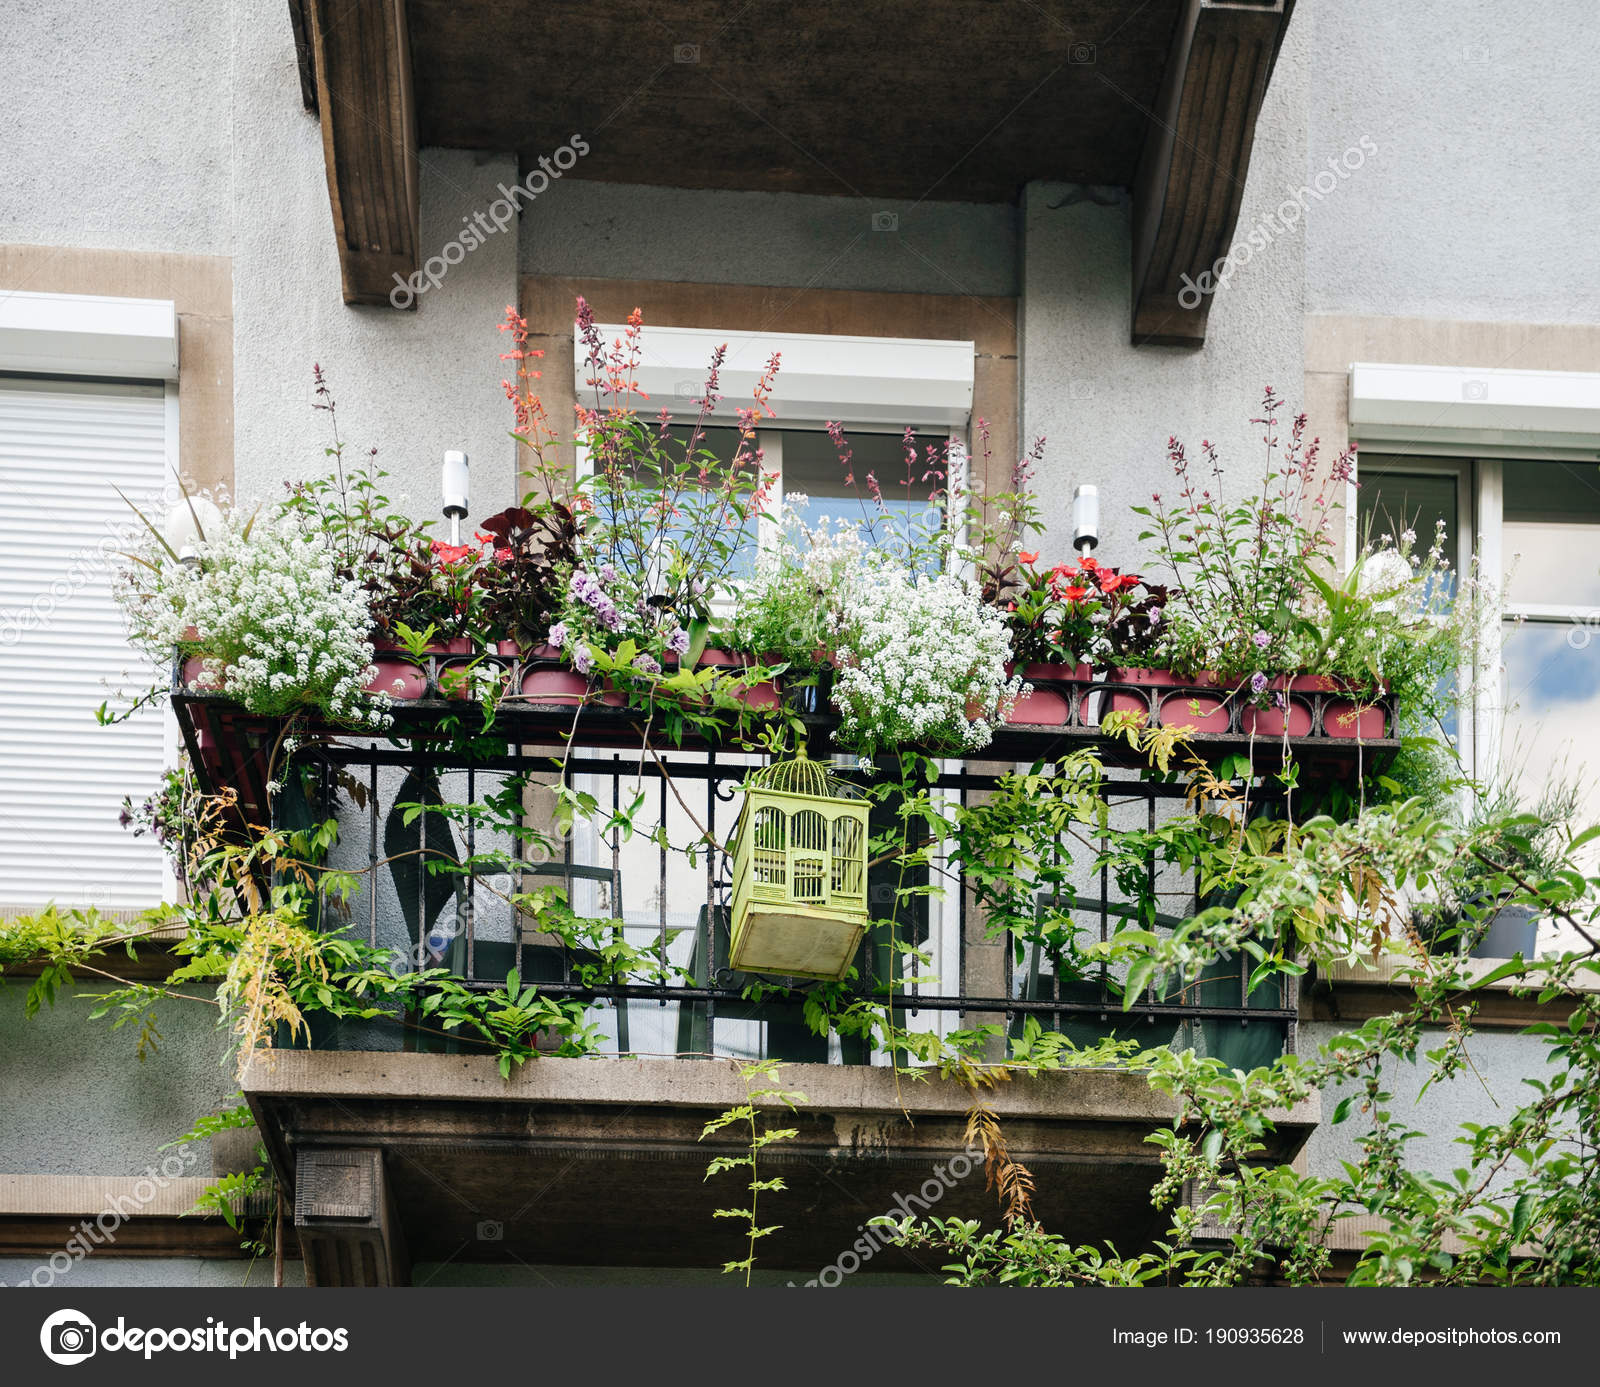 Blumentpfe fr balkon sicherheit auf dem balkon for Blumentopf verkleidung